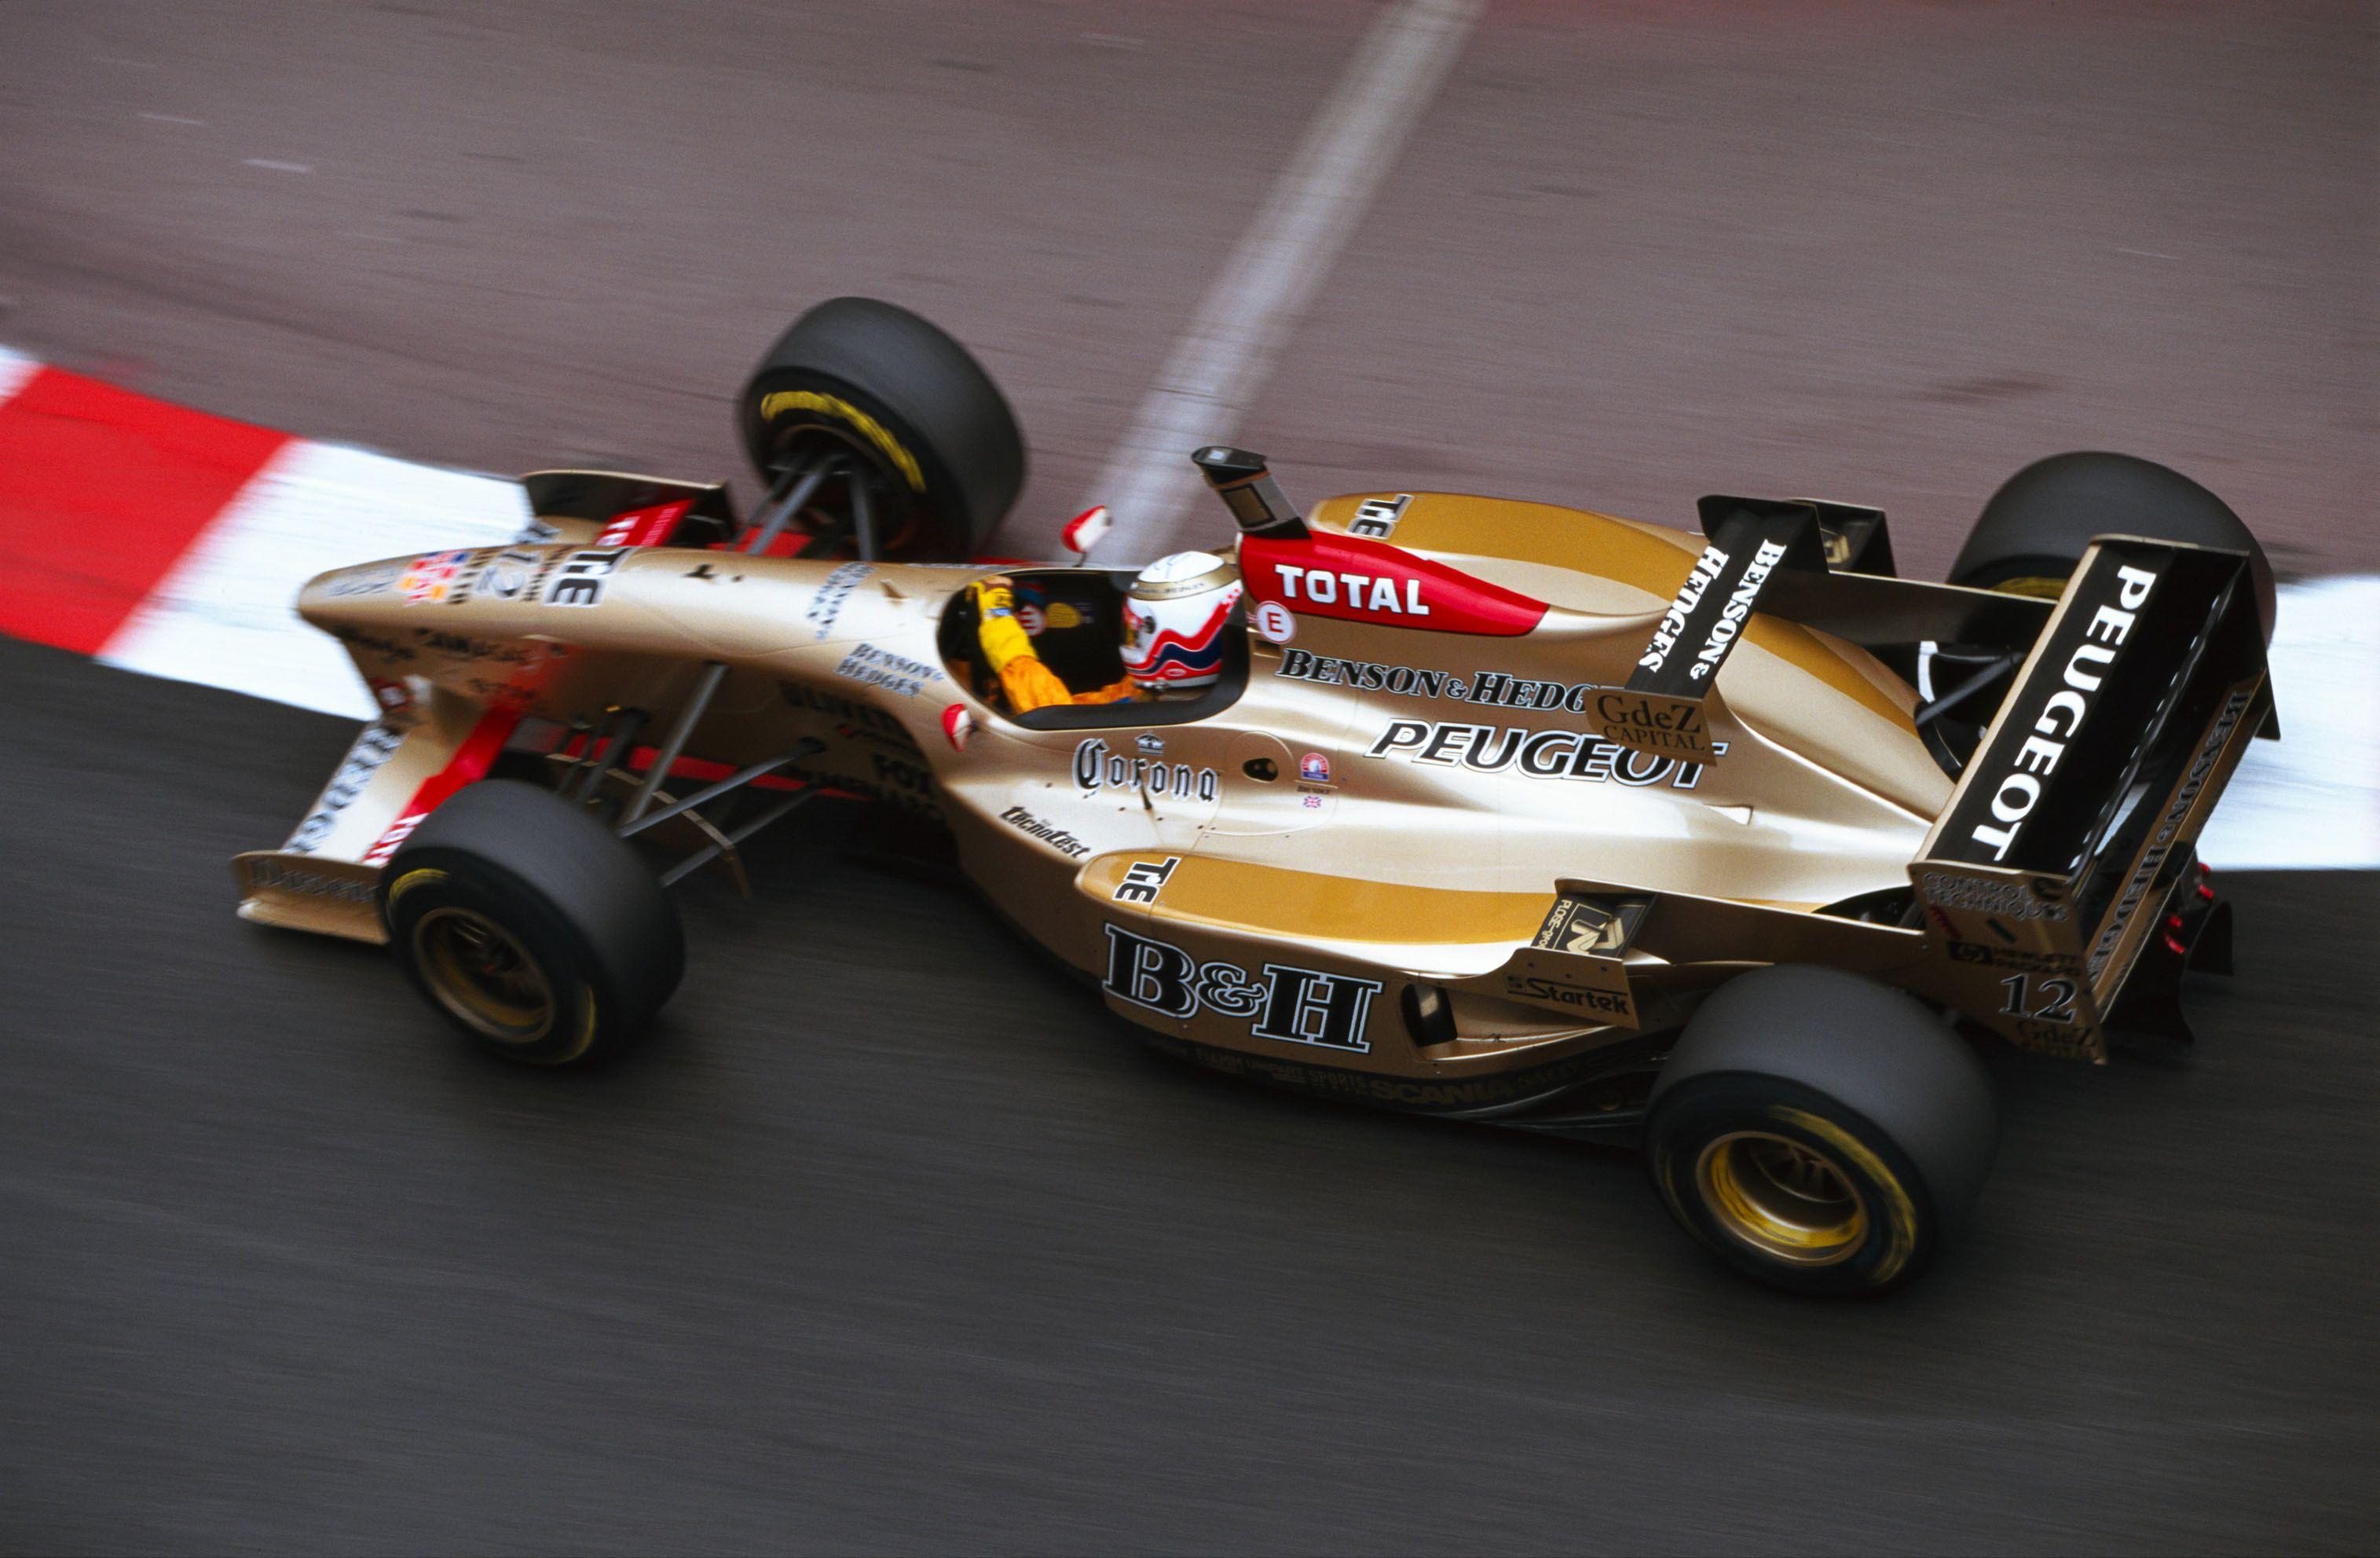 Jordan Peugeot 196 F1